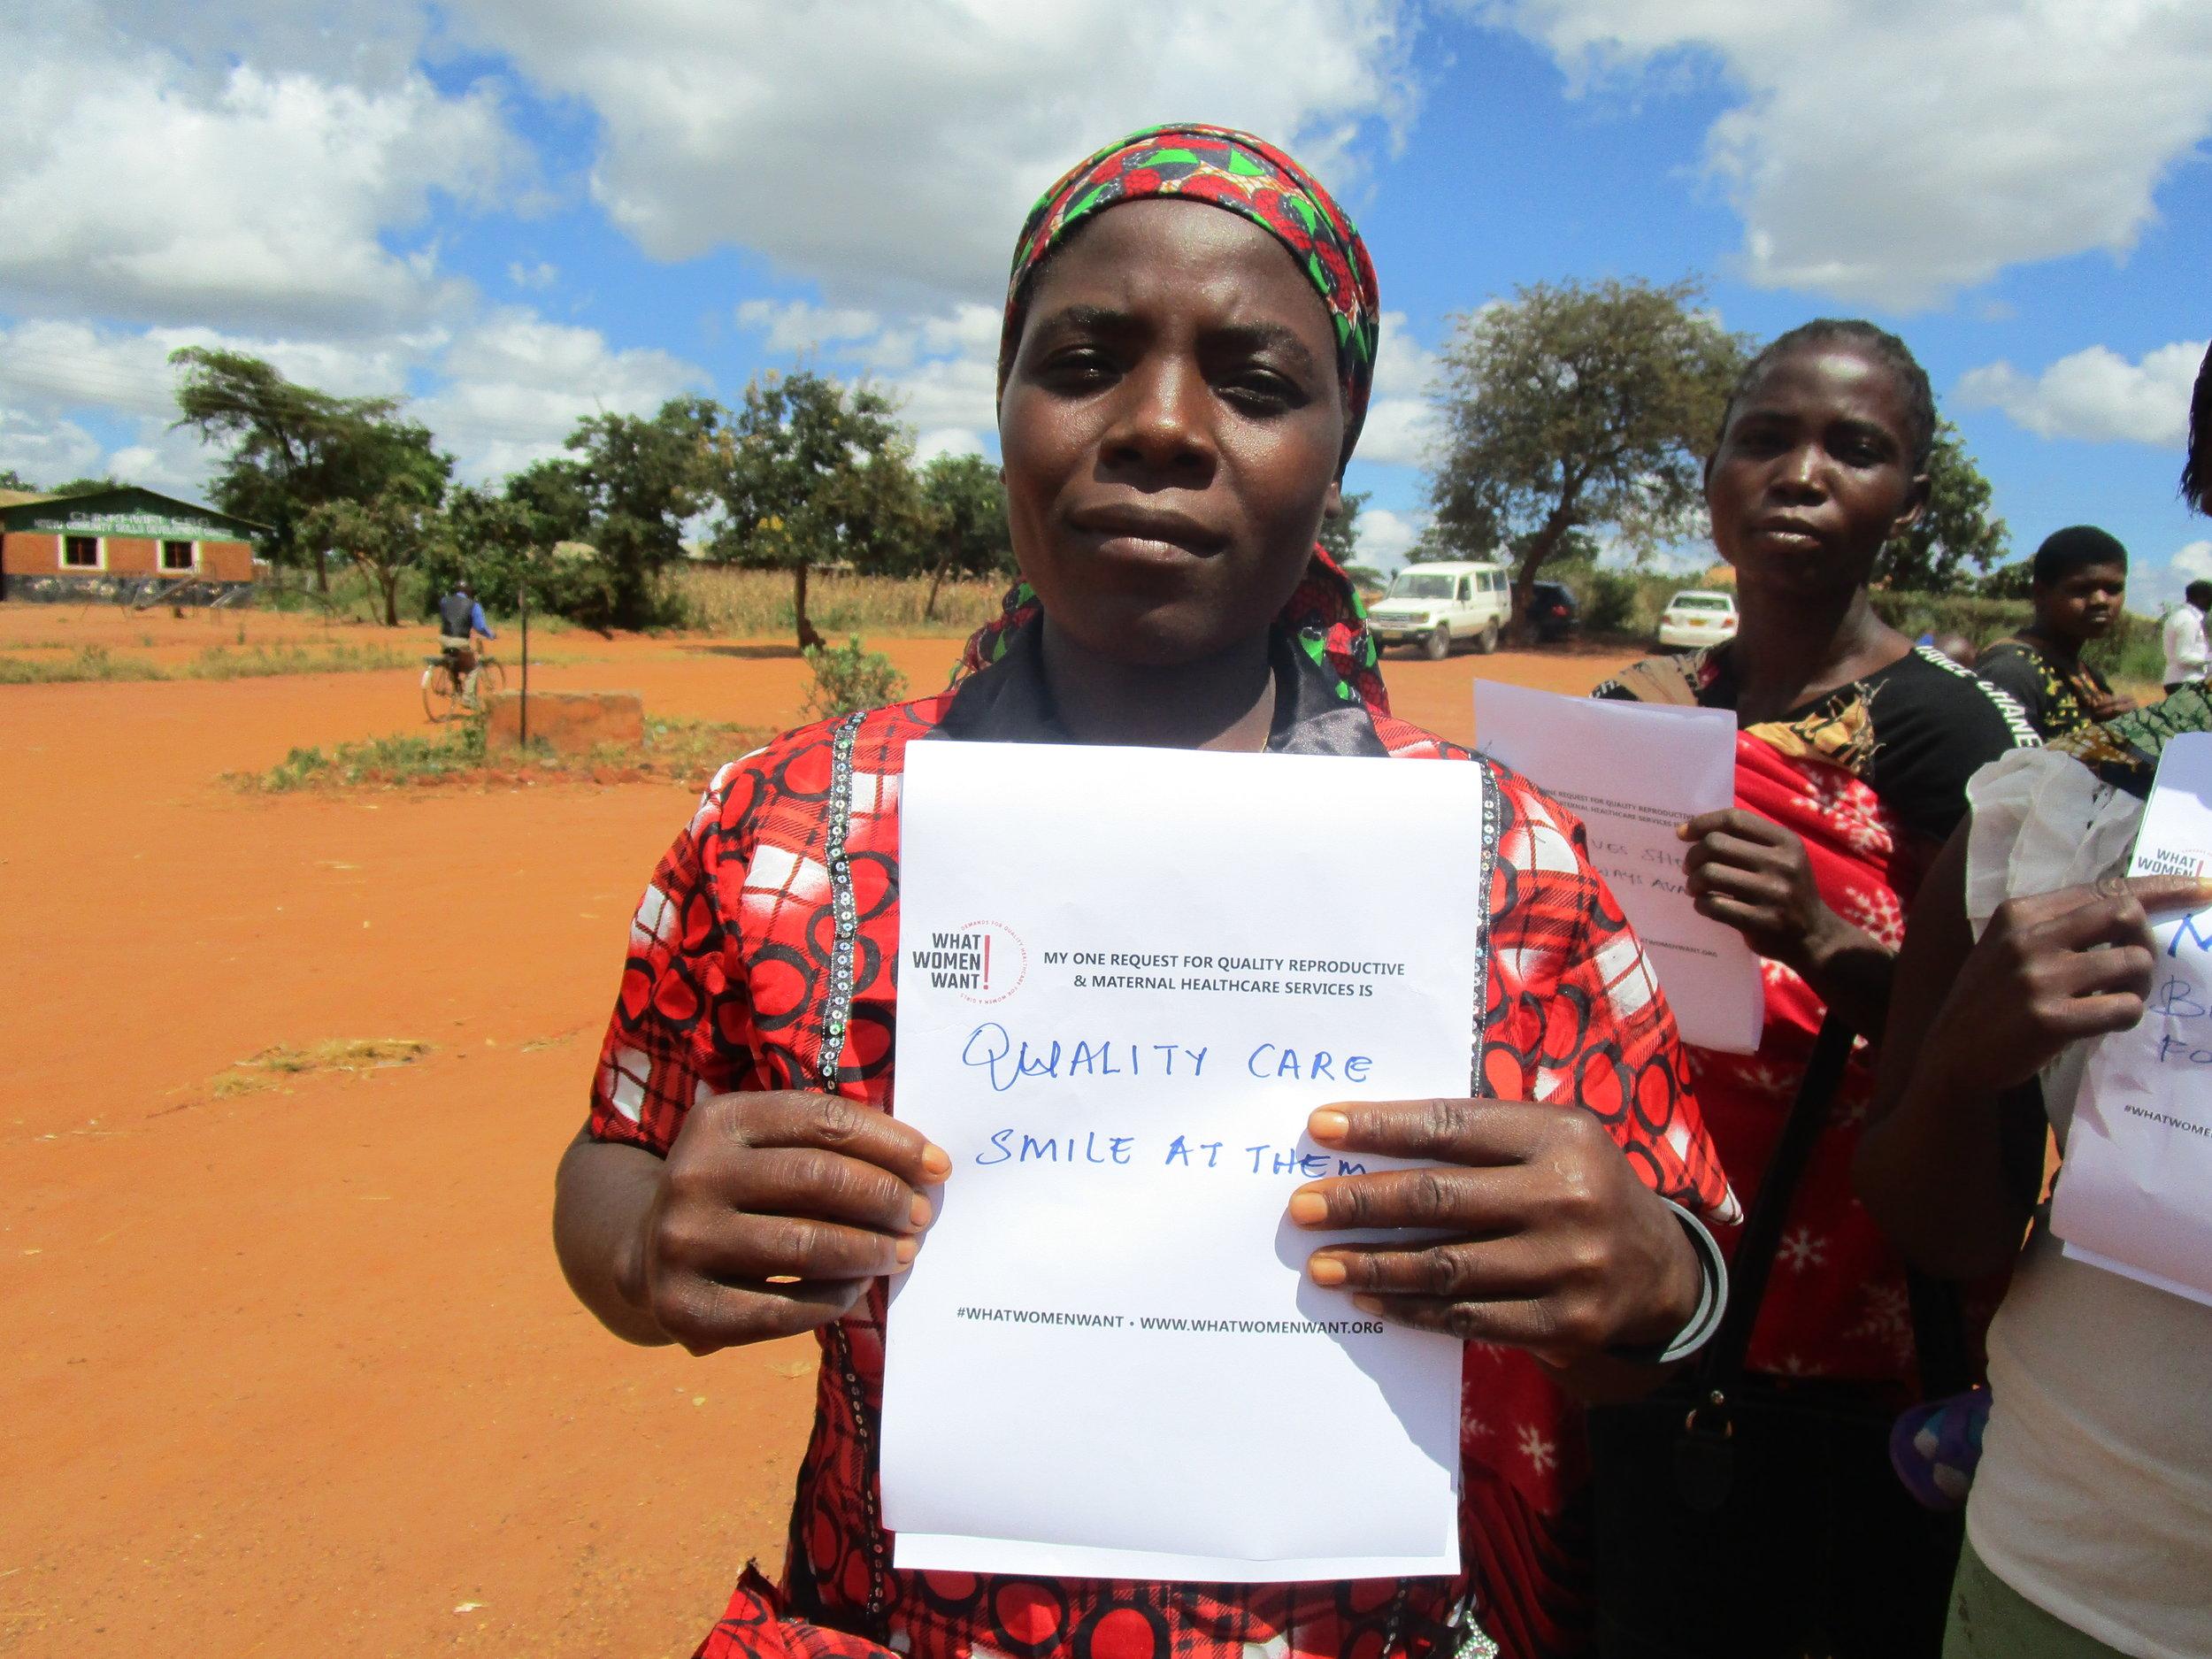 Mobilization_Malawi_smile.JPG